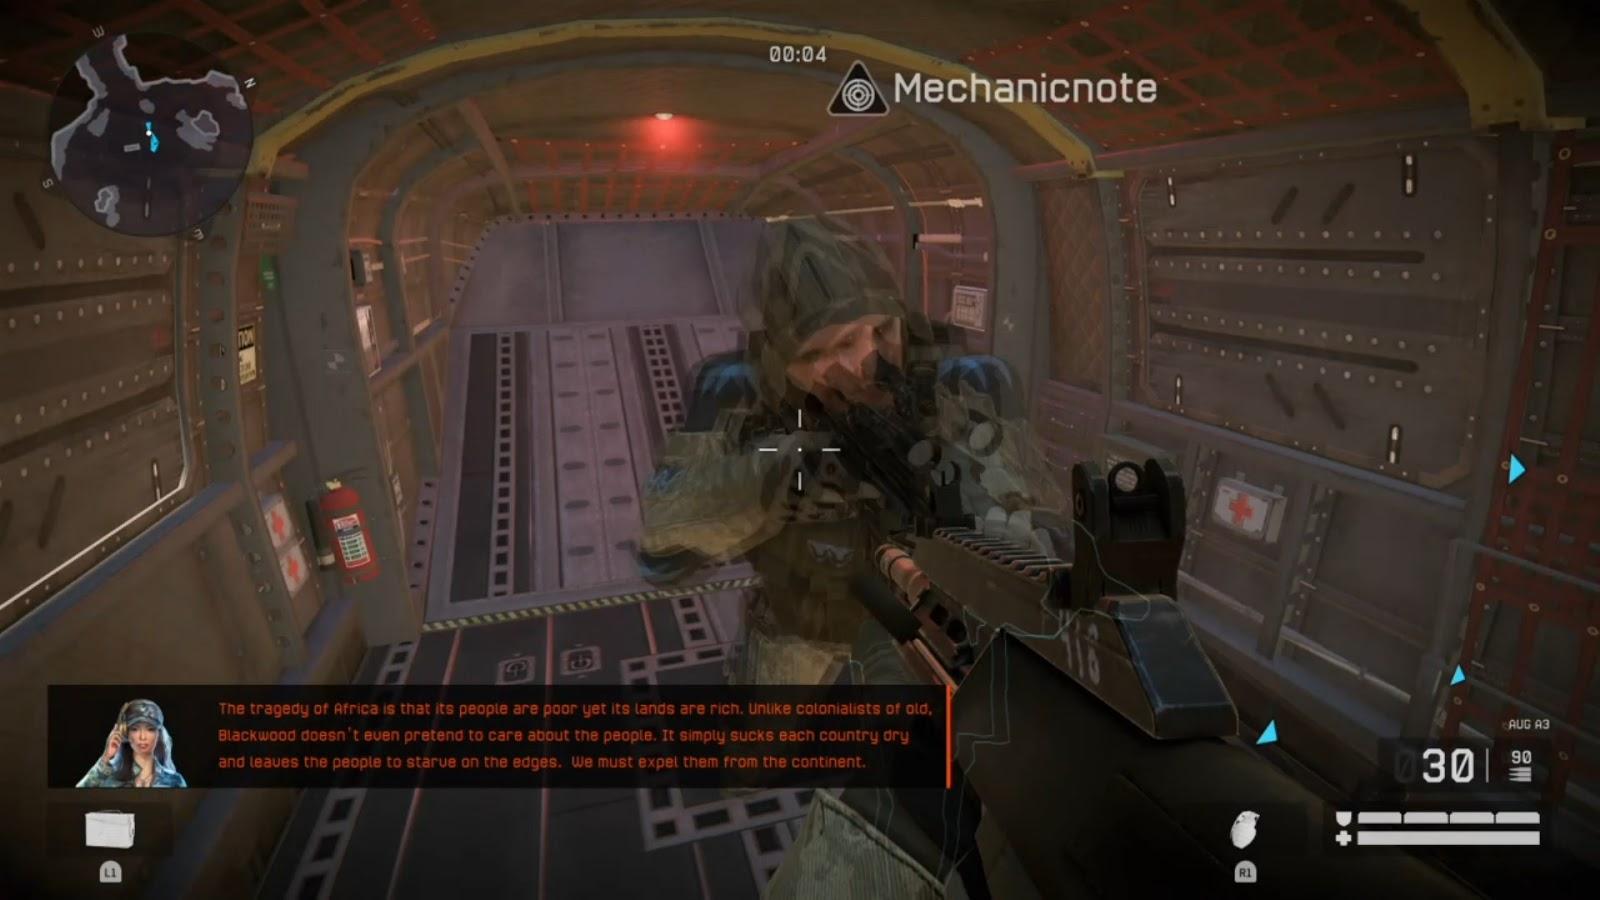 Ps4 Quick Look | Warface (2013) Fun till MEDIC Paywall    | Gaming